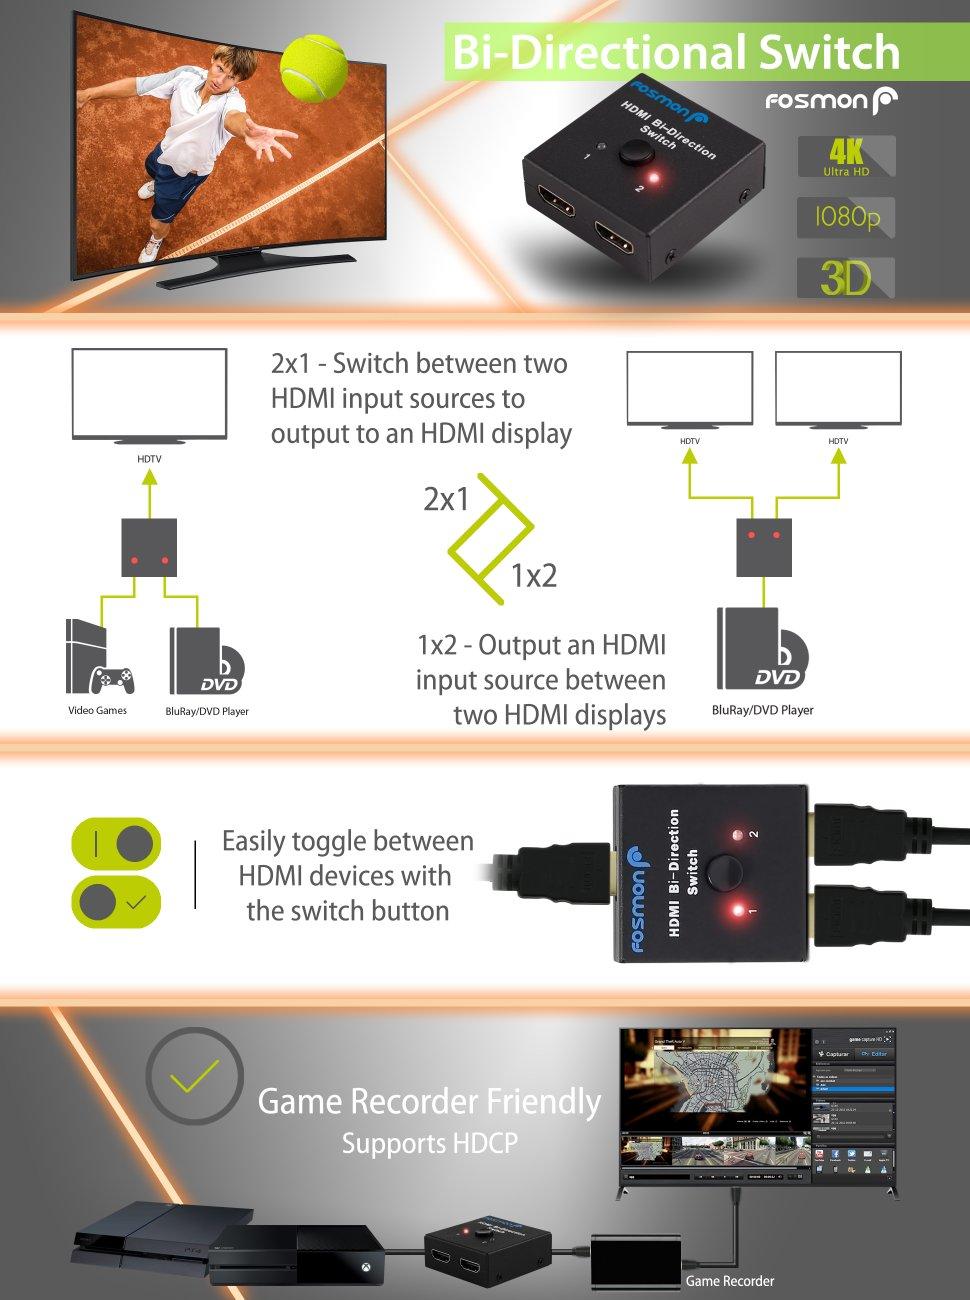 4k Commutateur Hdmi Hub 1080p Switch Splitter 3d 3 Ports Full Hd Répartiteur High Standard In Quality And Hygiene Wire, Cable & Conduit Tv, Video & Audio Accessories